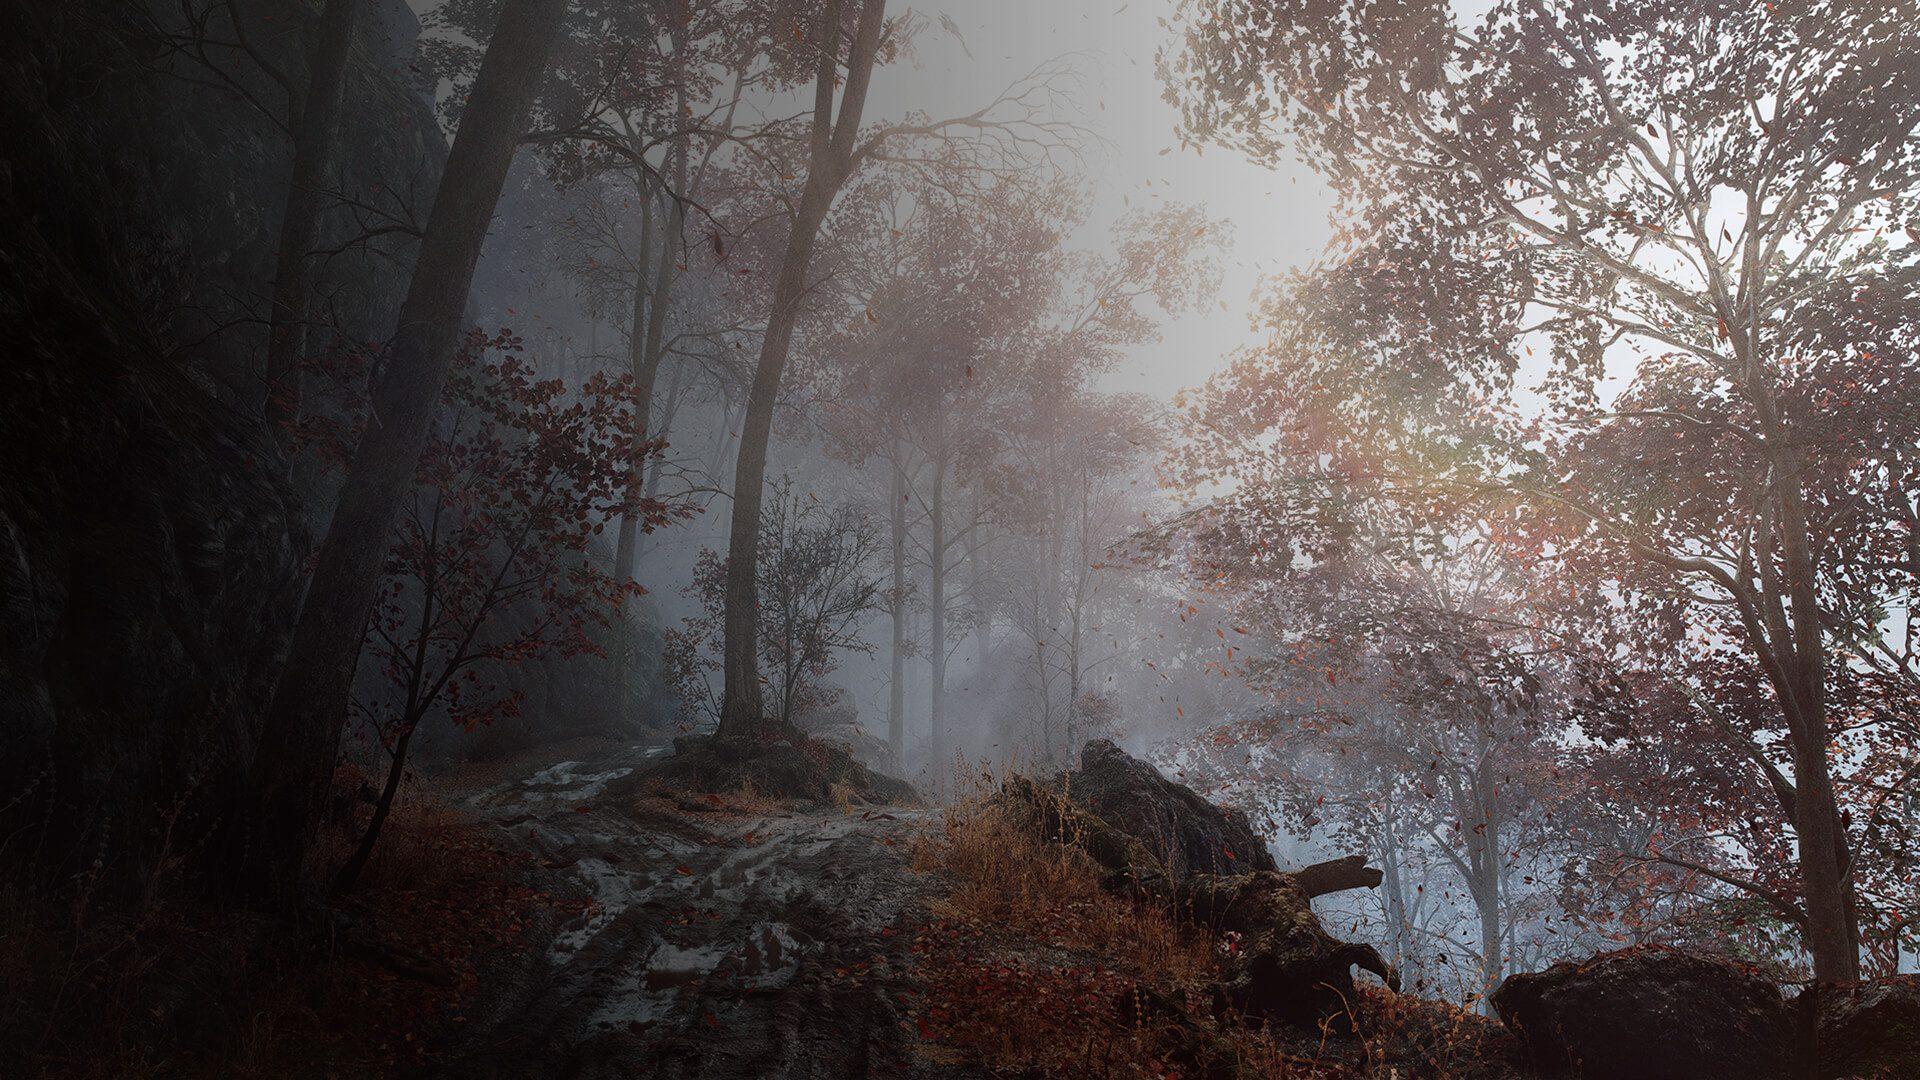 Tirailleur   Battlefield Wiki   FANDOM powered by Wikia